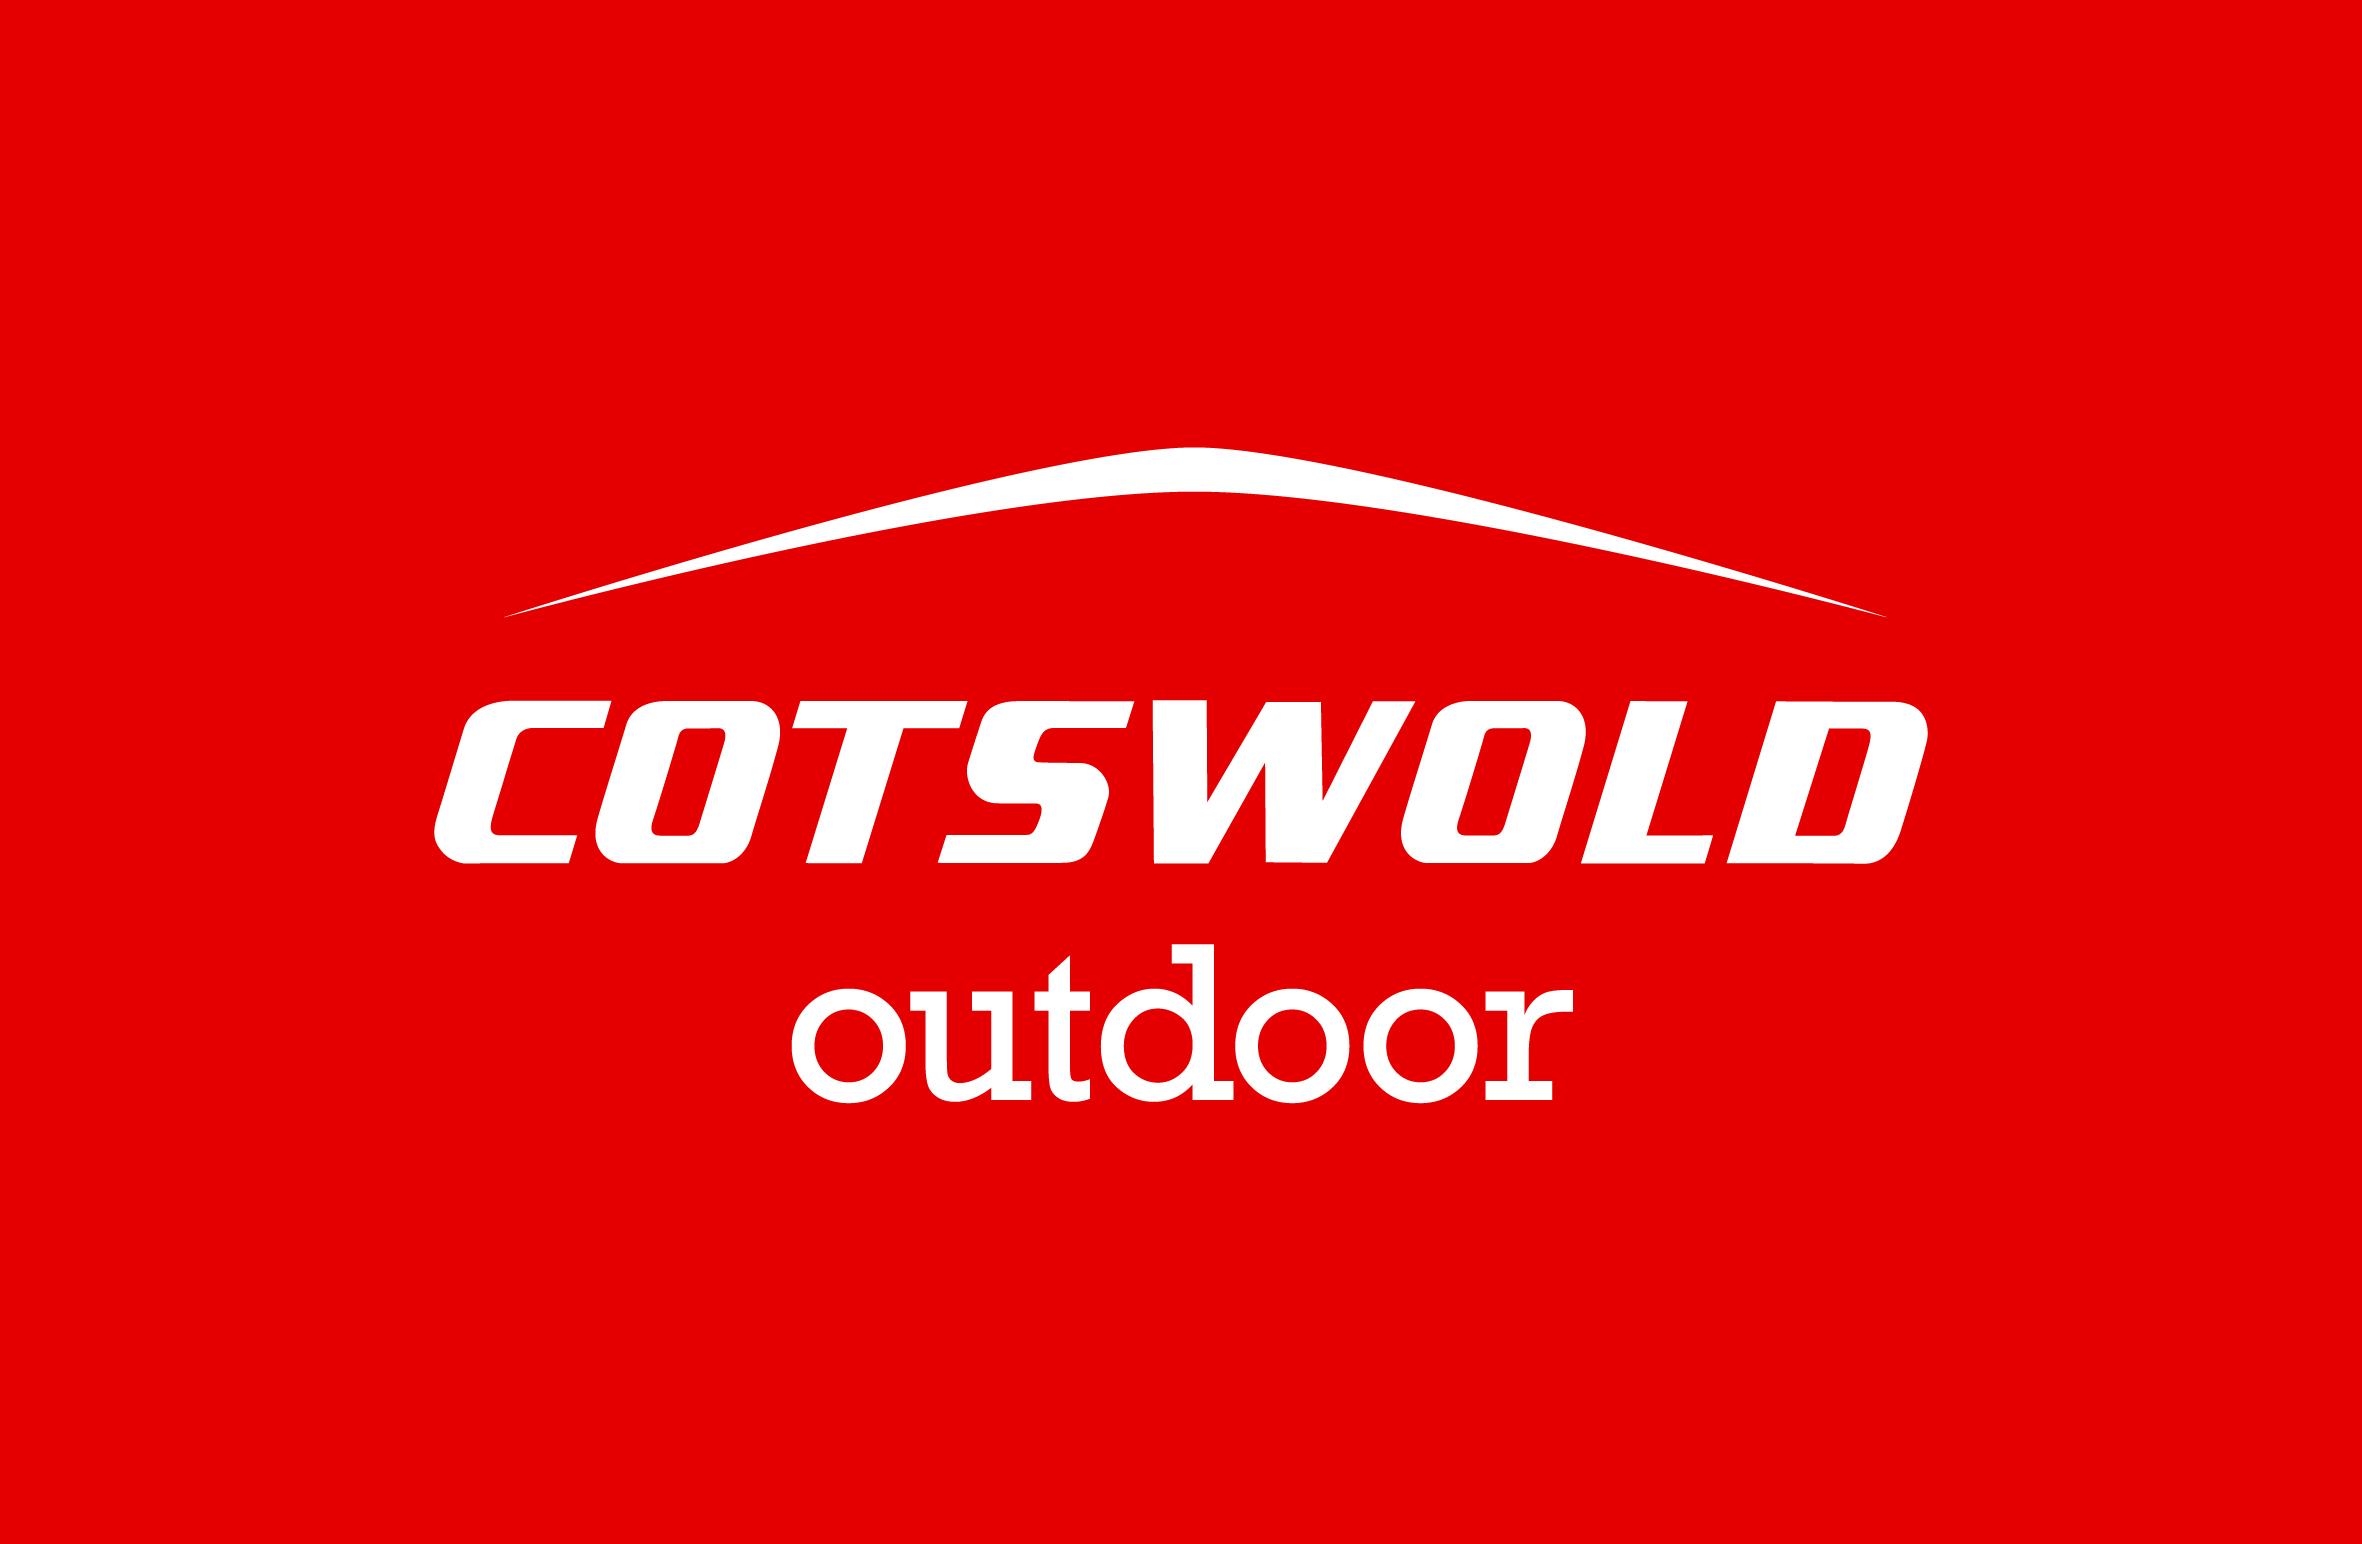 cotswold_outdoor_logo.jpg